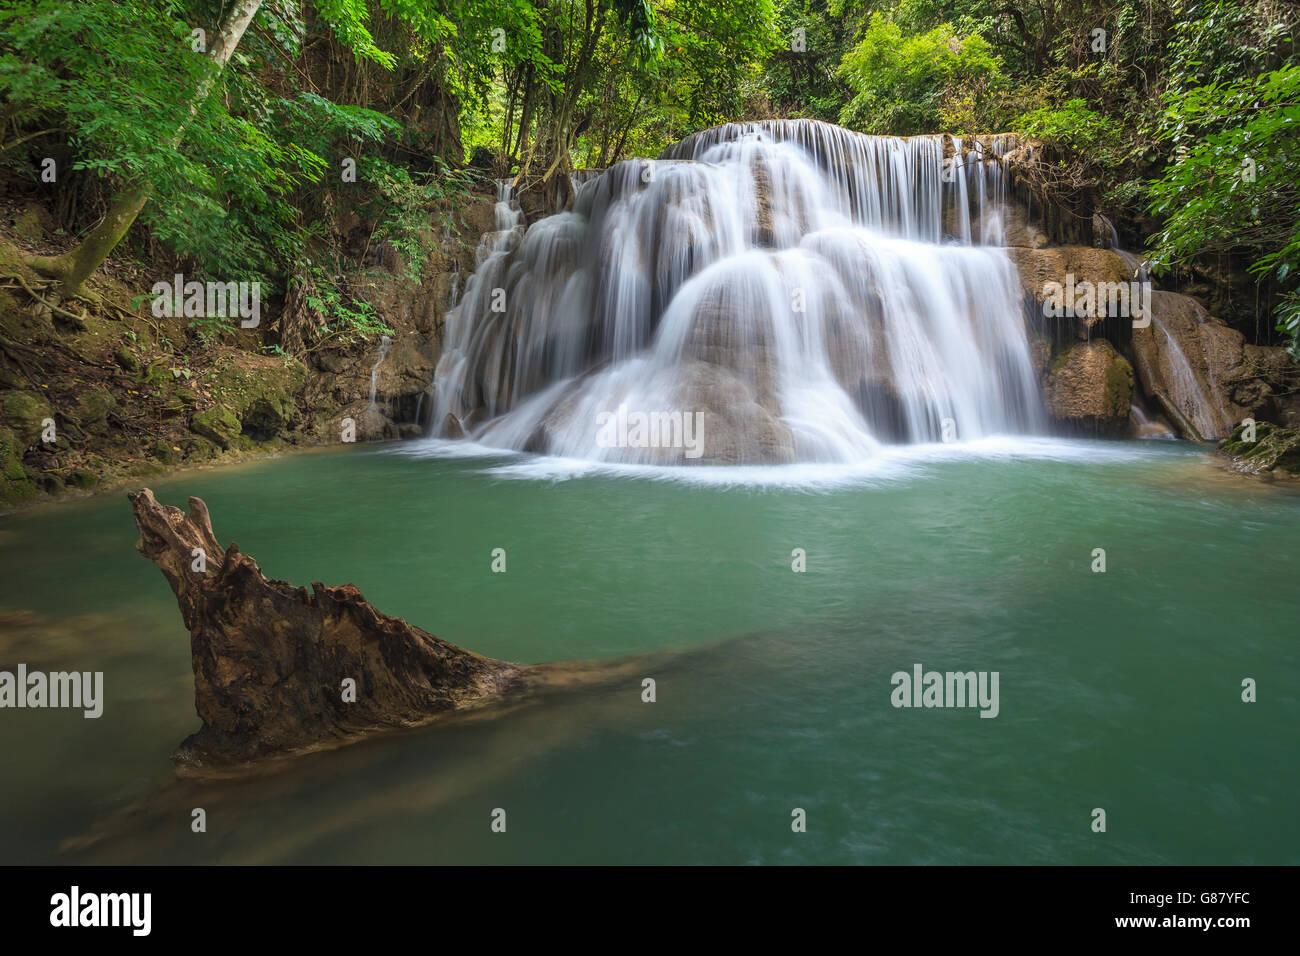 Hua Mae Kamin waterfall, Kanchanaburi, Thailand - Stock Image